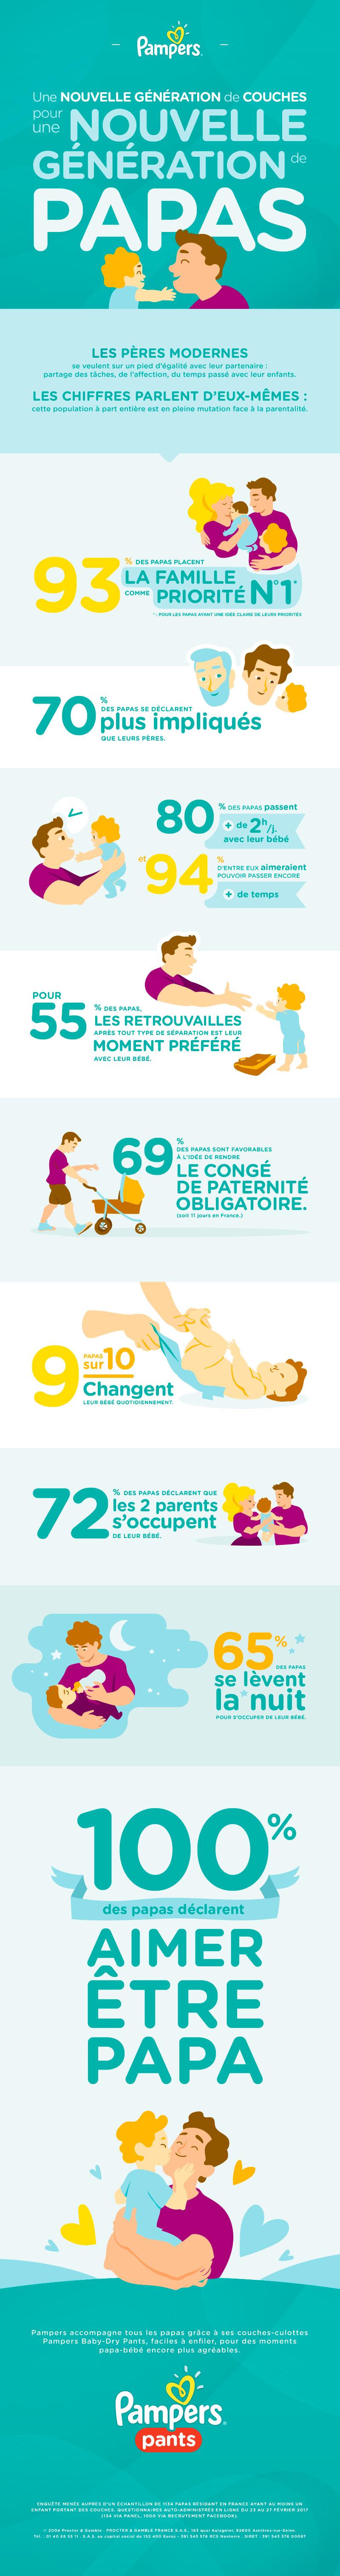 Pampers-infographie_2017 papas bébés